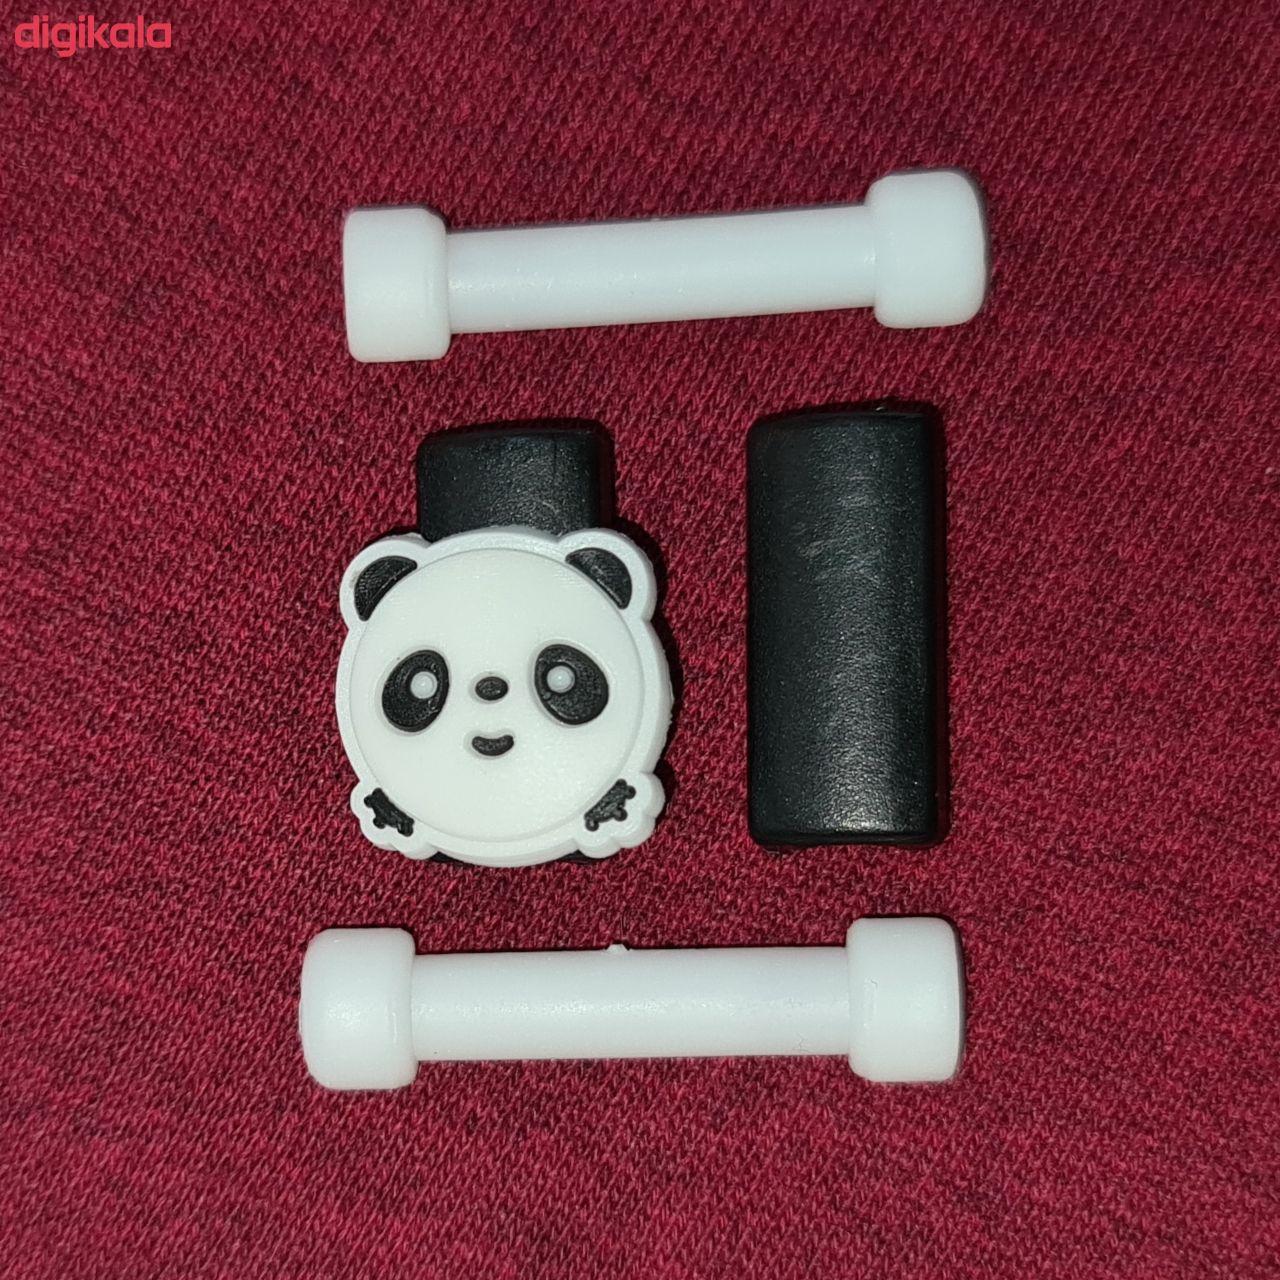 محافظ کابل مدل Panda K01 main 1 1